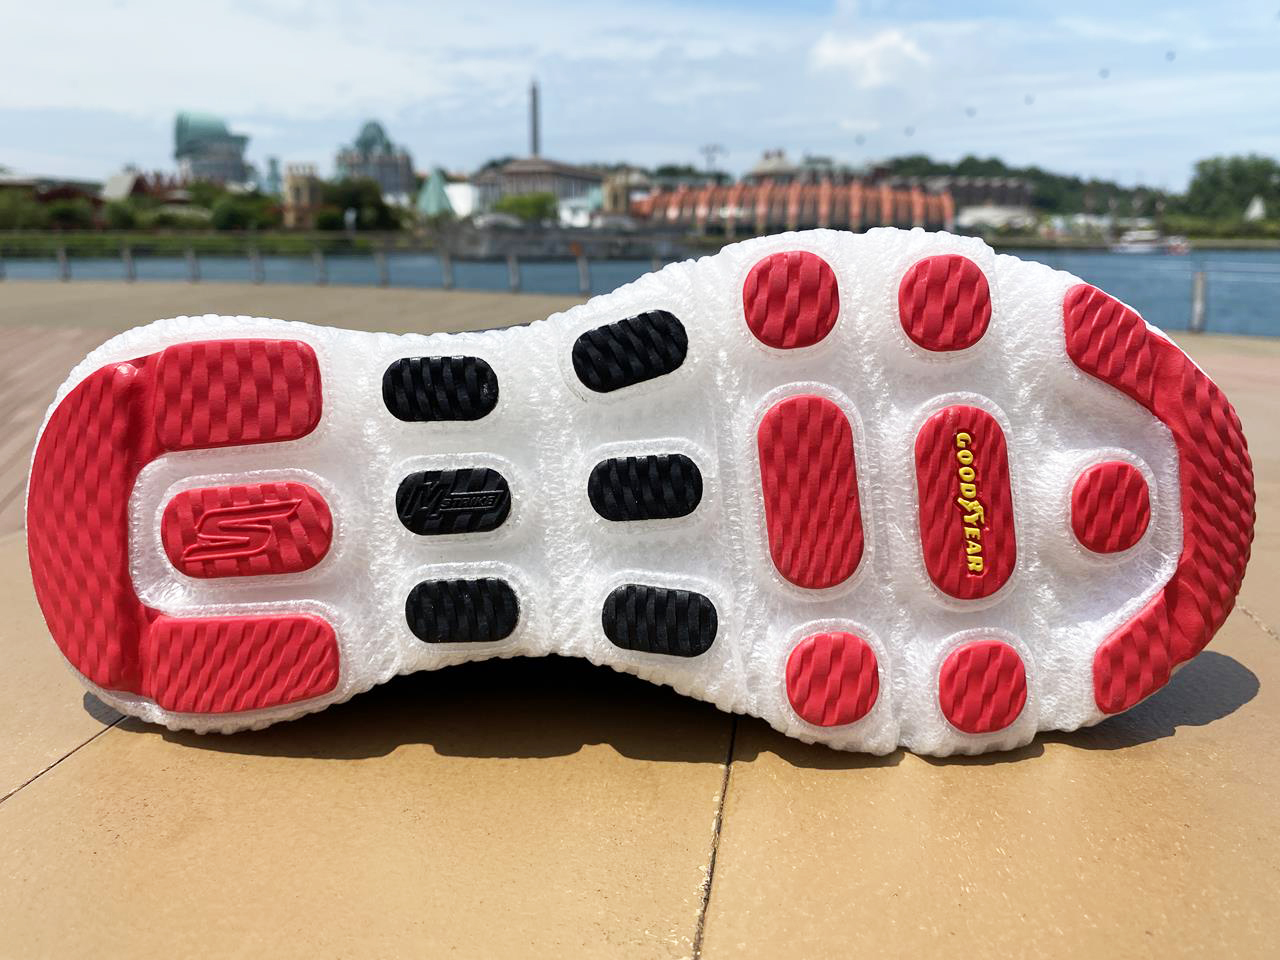 Skechers GOrun MaxRoad 4+ Hyper - Sole